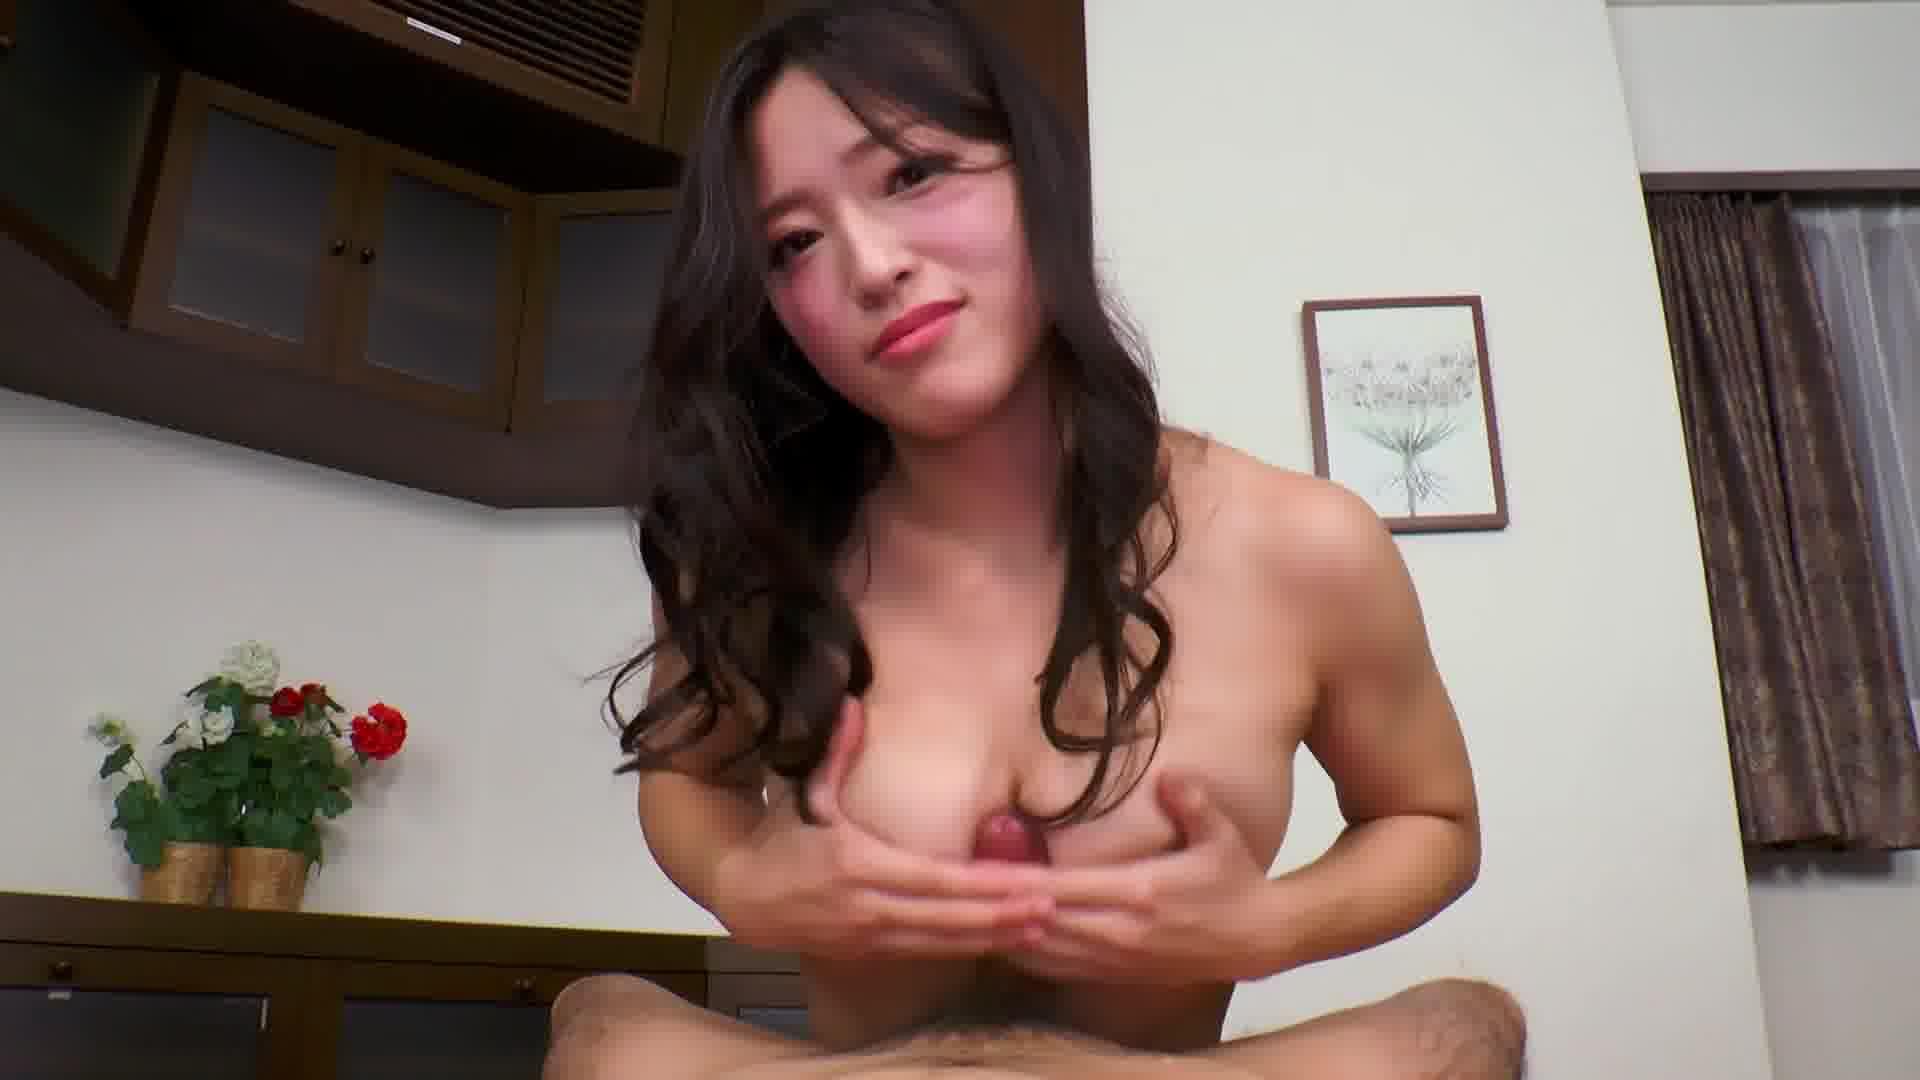 THE 未公開 〜パイずりコキコキ天国〜 - 日高千晶【巨乳・パイズリ・手コキ】